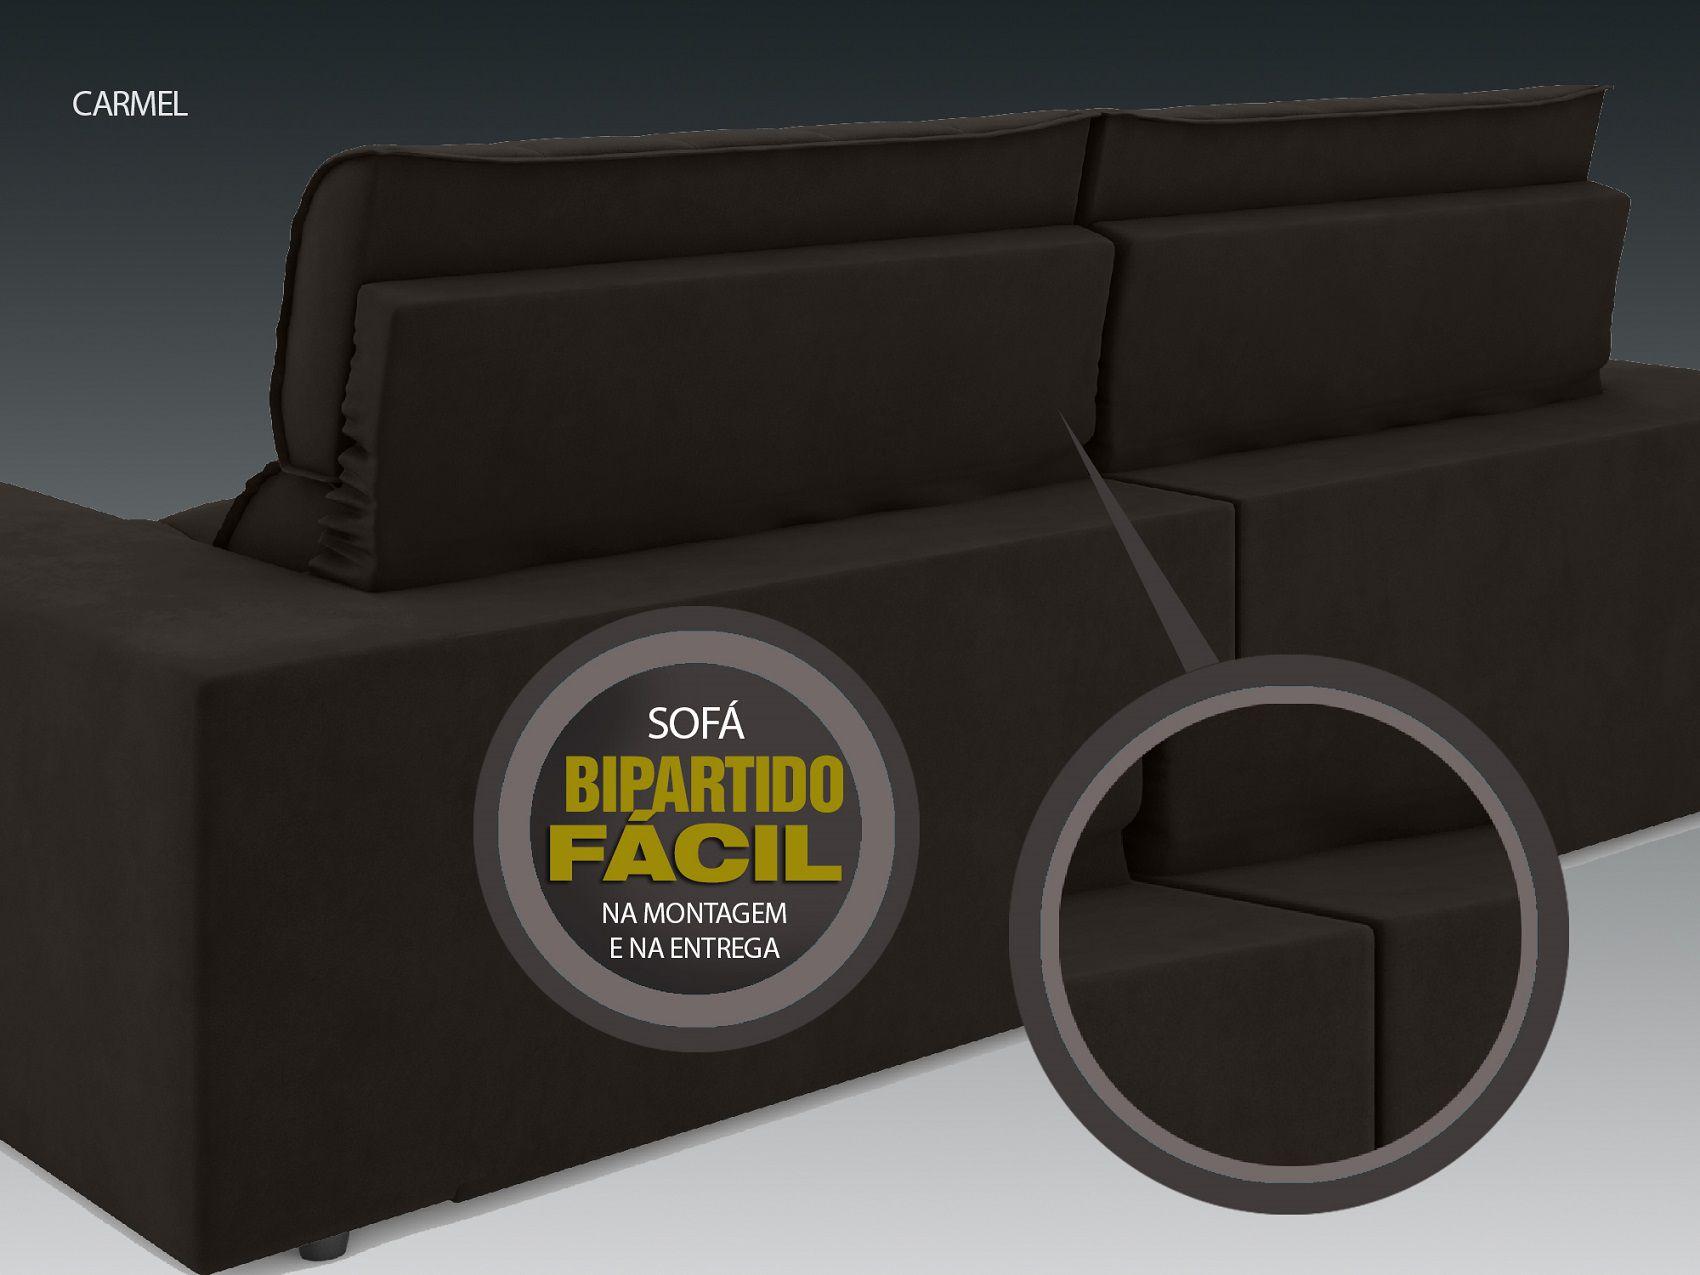 Sofá 5 Lugares Net Carmel Assento Retrátil e Reclinável Chocolate 2,50m